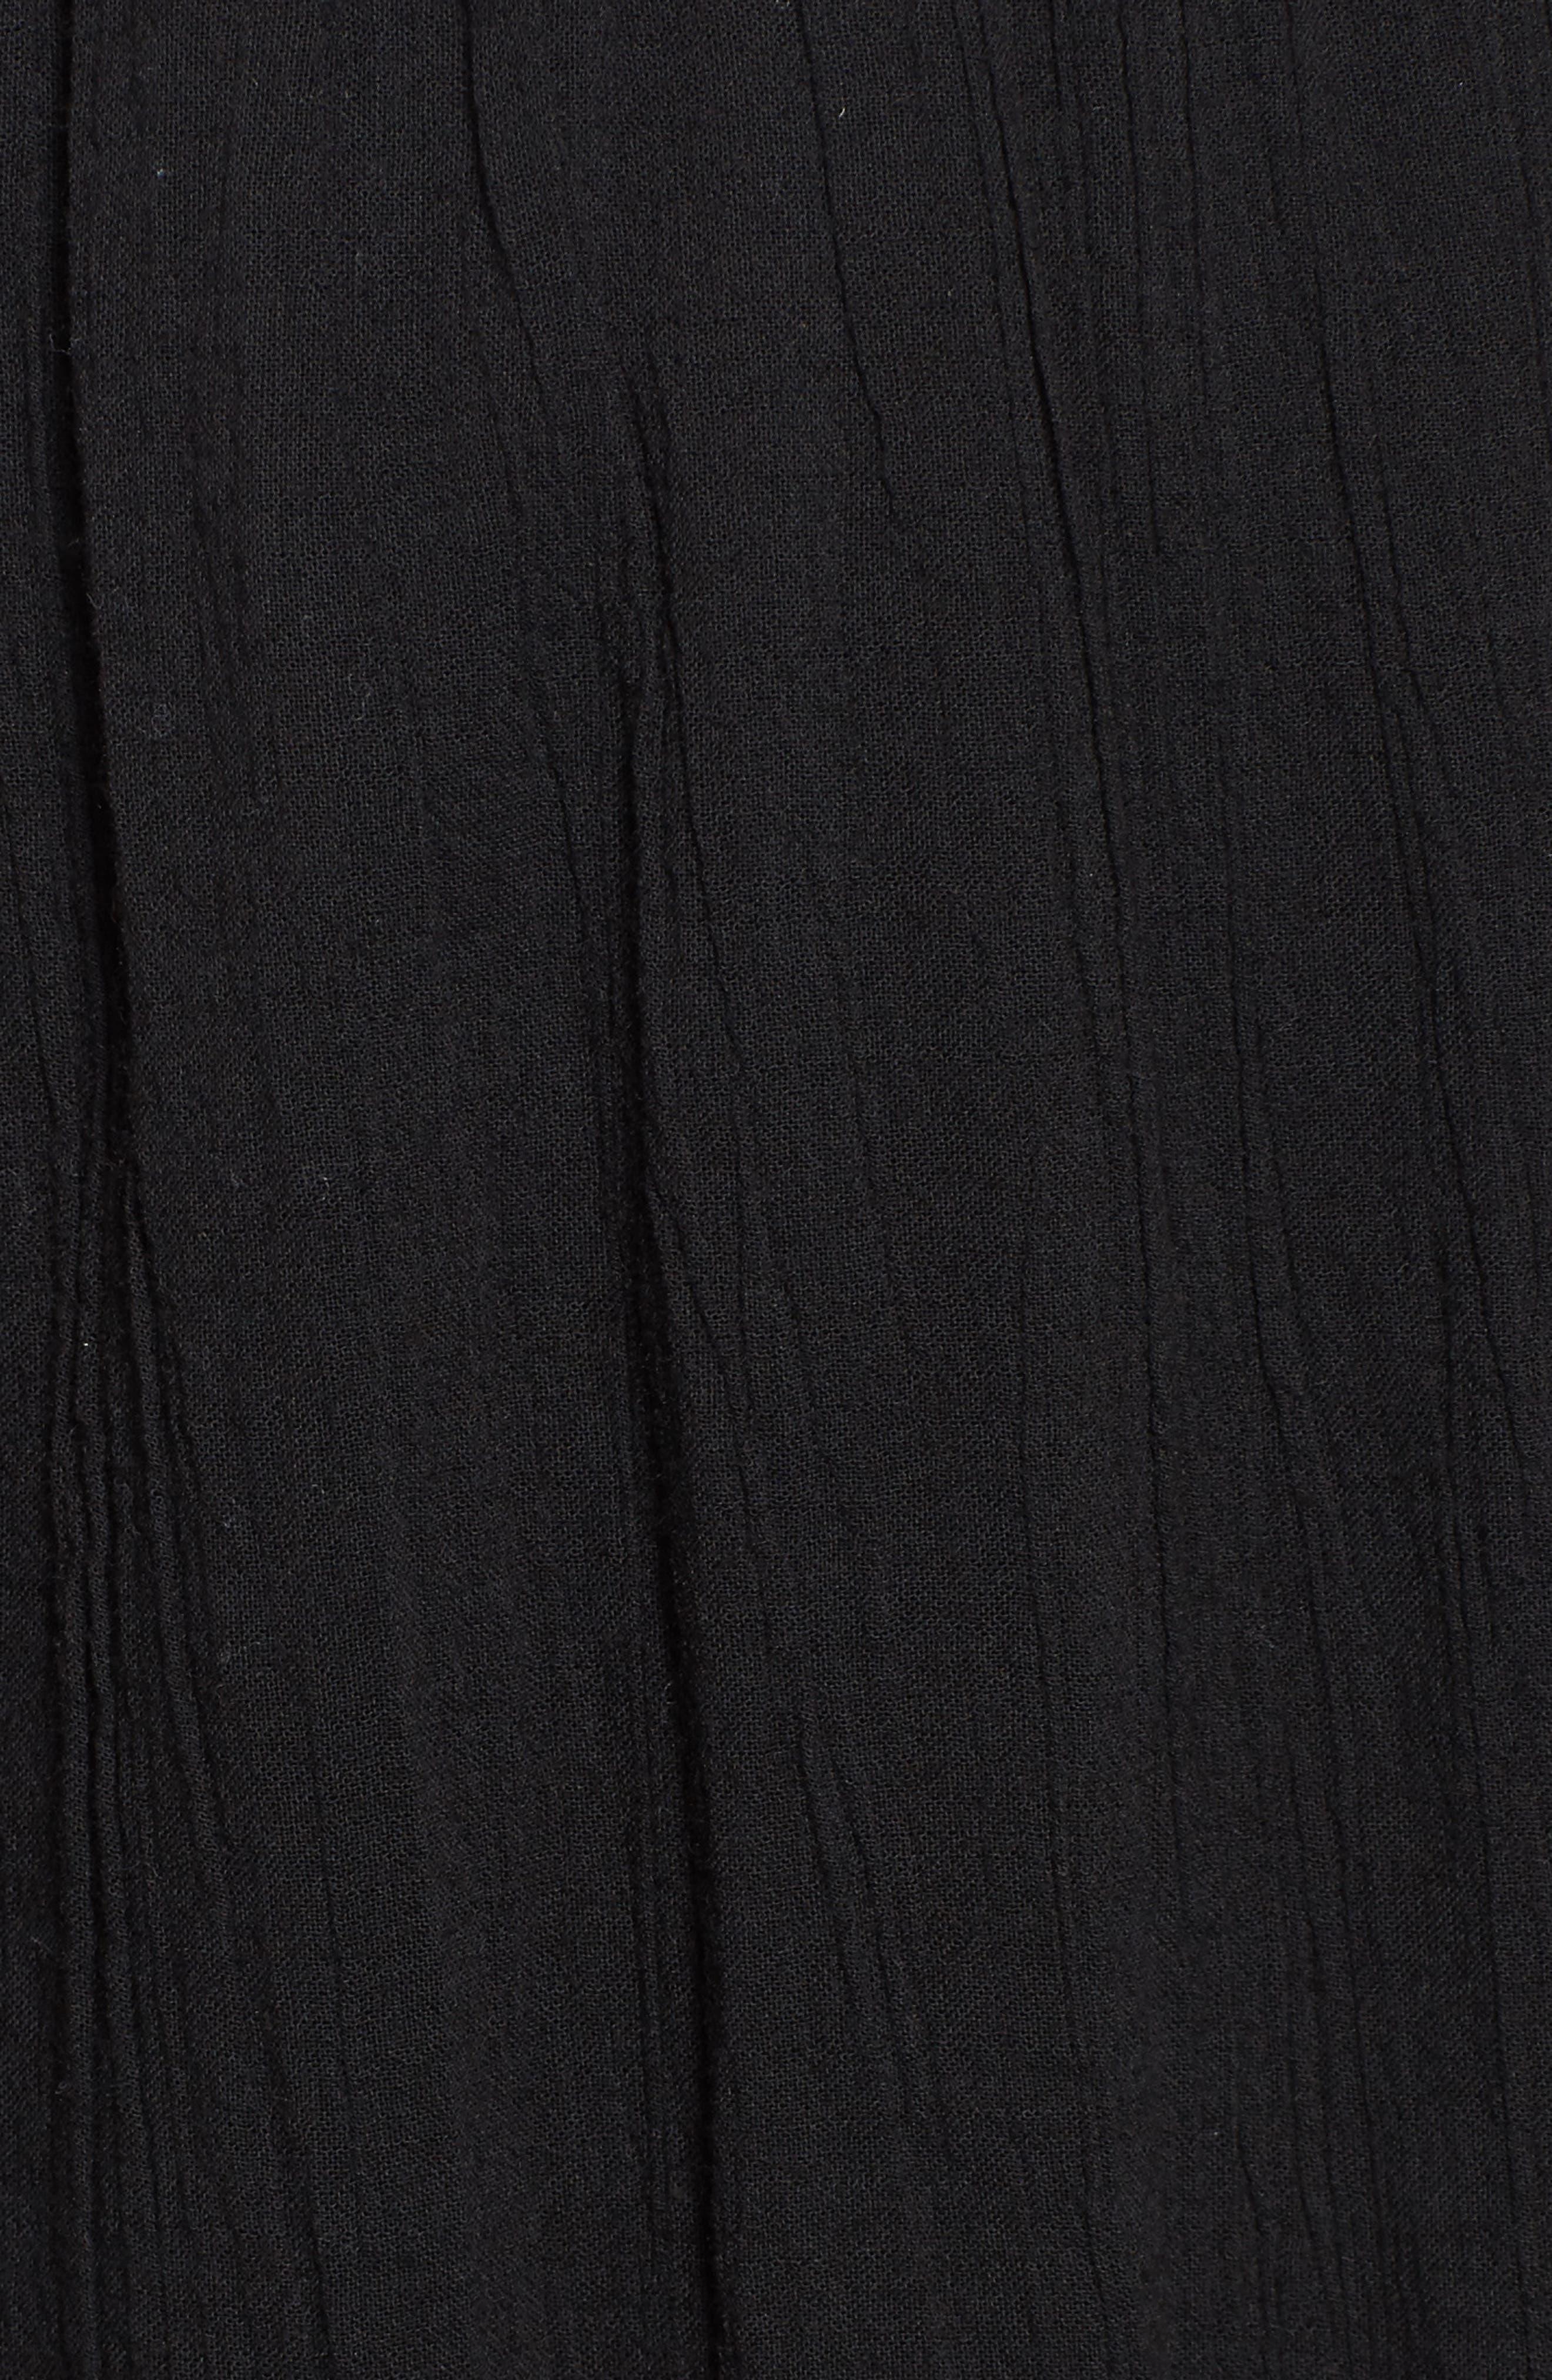 Gauze Midi Skirt,                             Alternate thumbnail 5, color,                             001